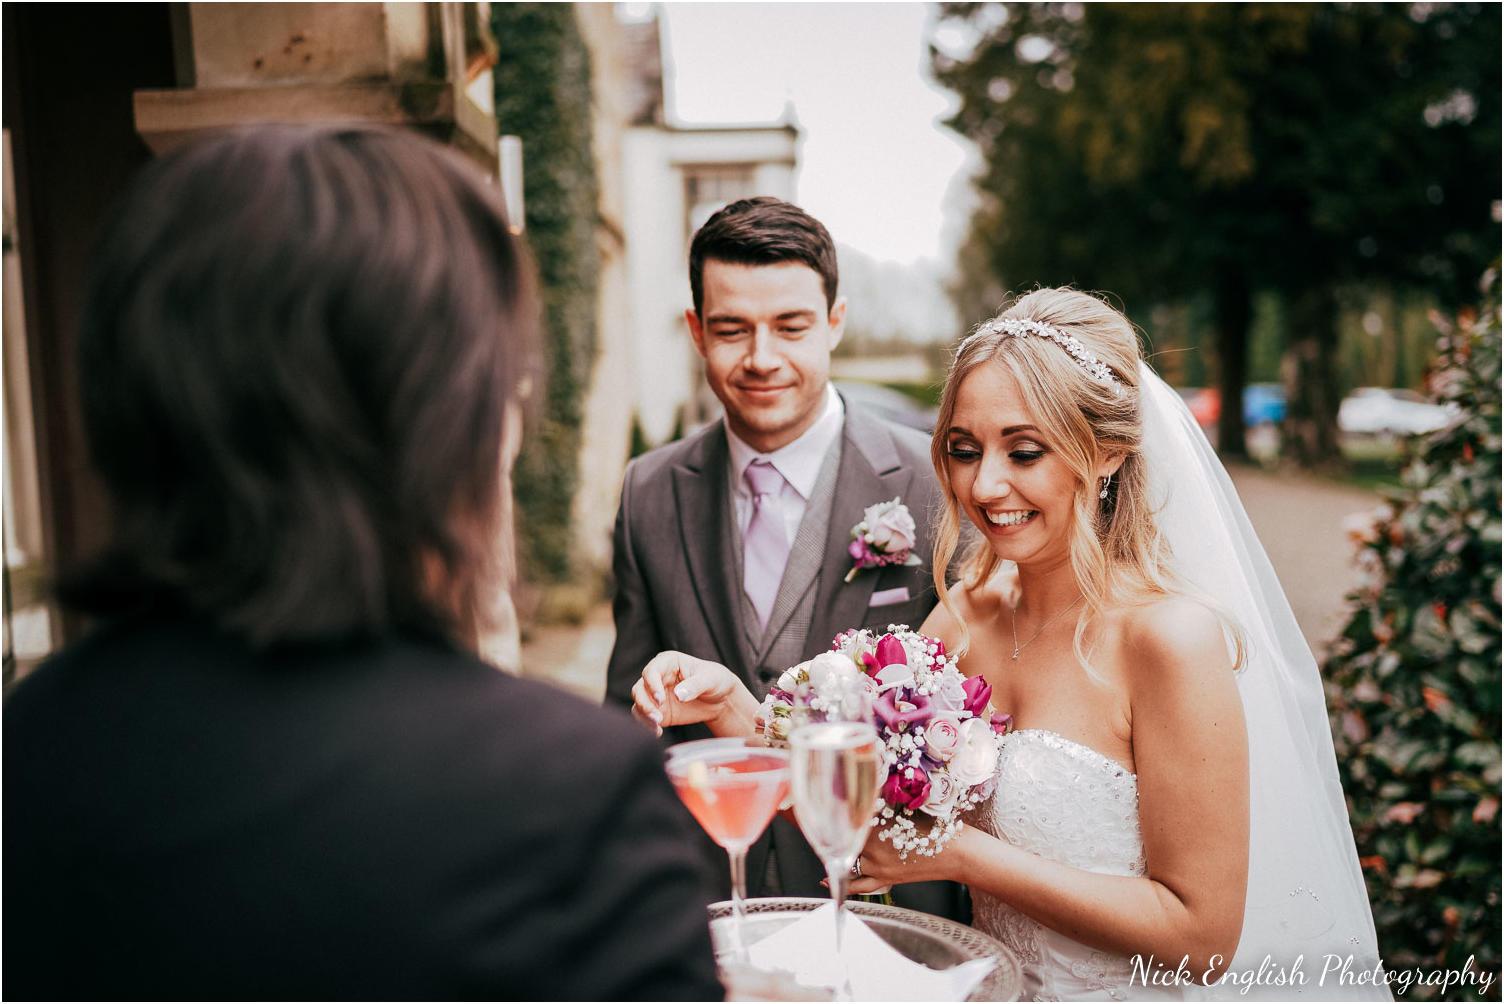 Mitton_Hall_Wedding_Photographer_2018-100.jpg